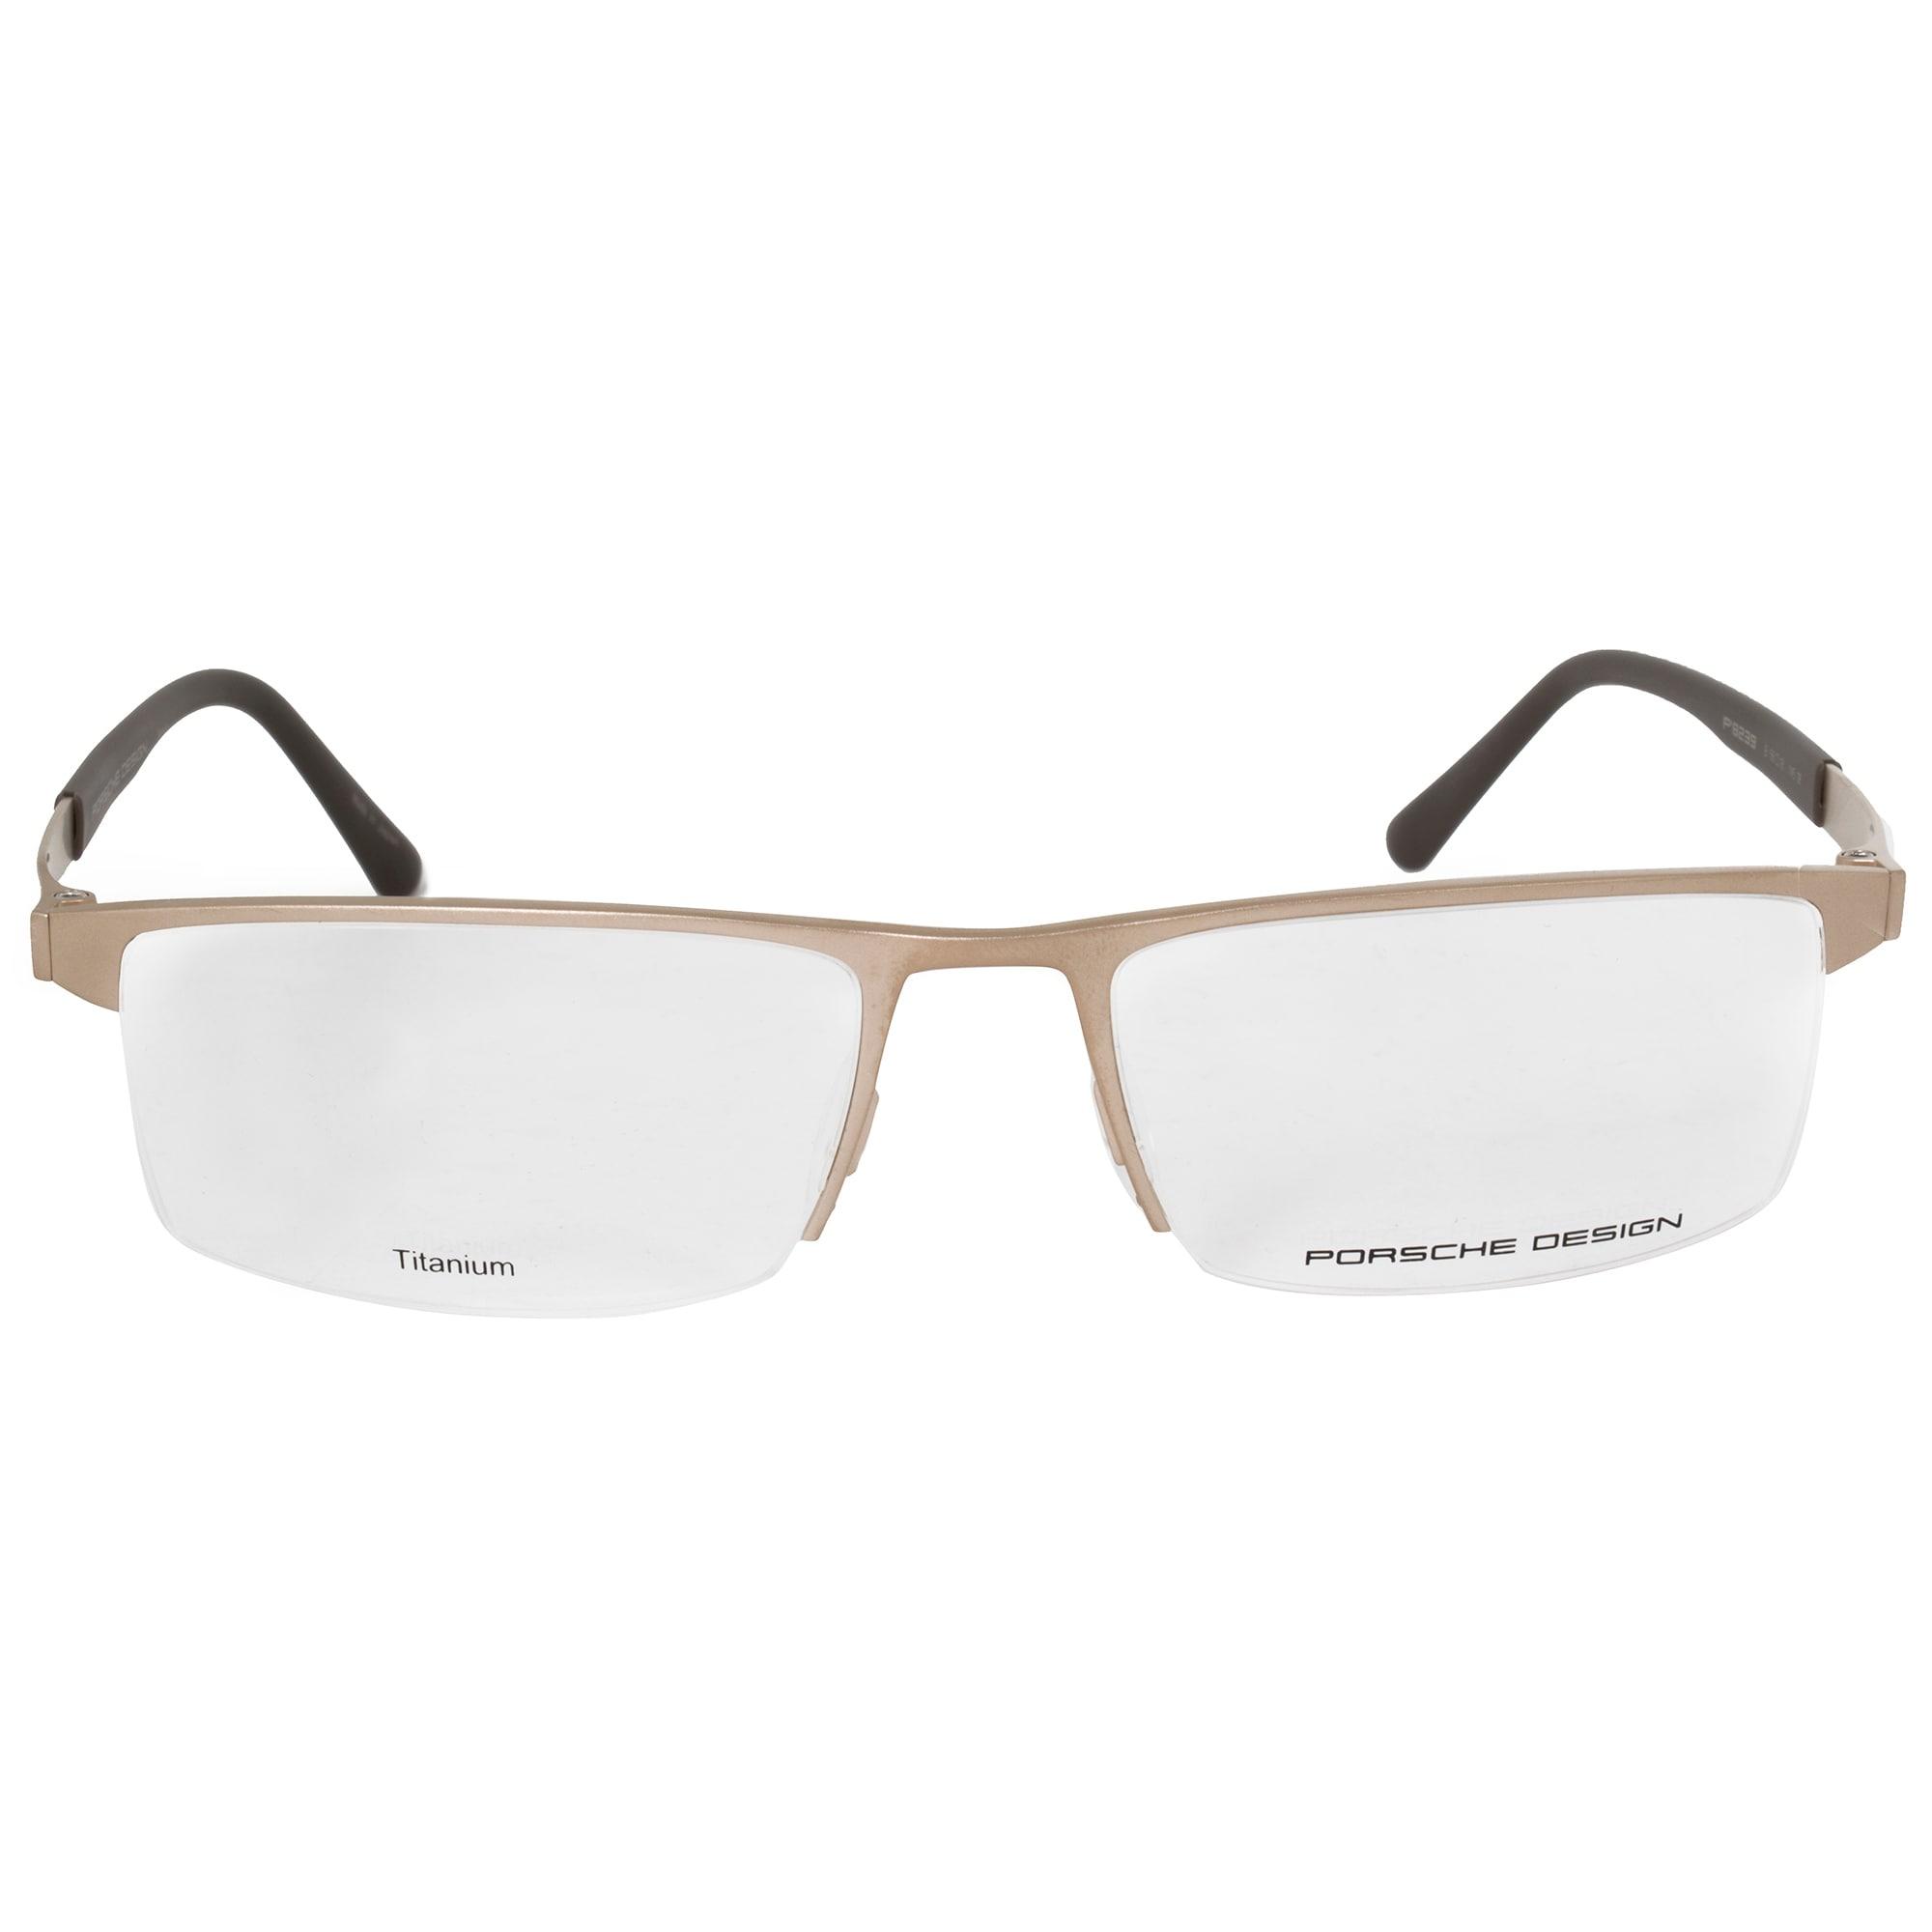 94521646a87c Buy Porsche Design Optical Frames Online at Overstock